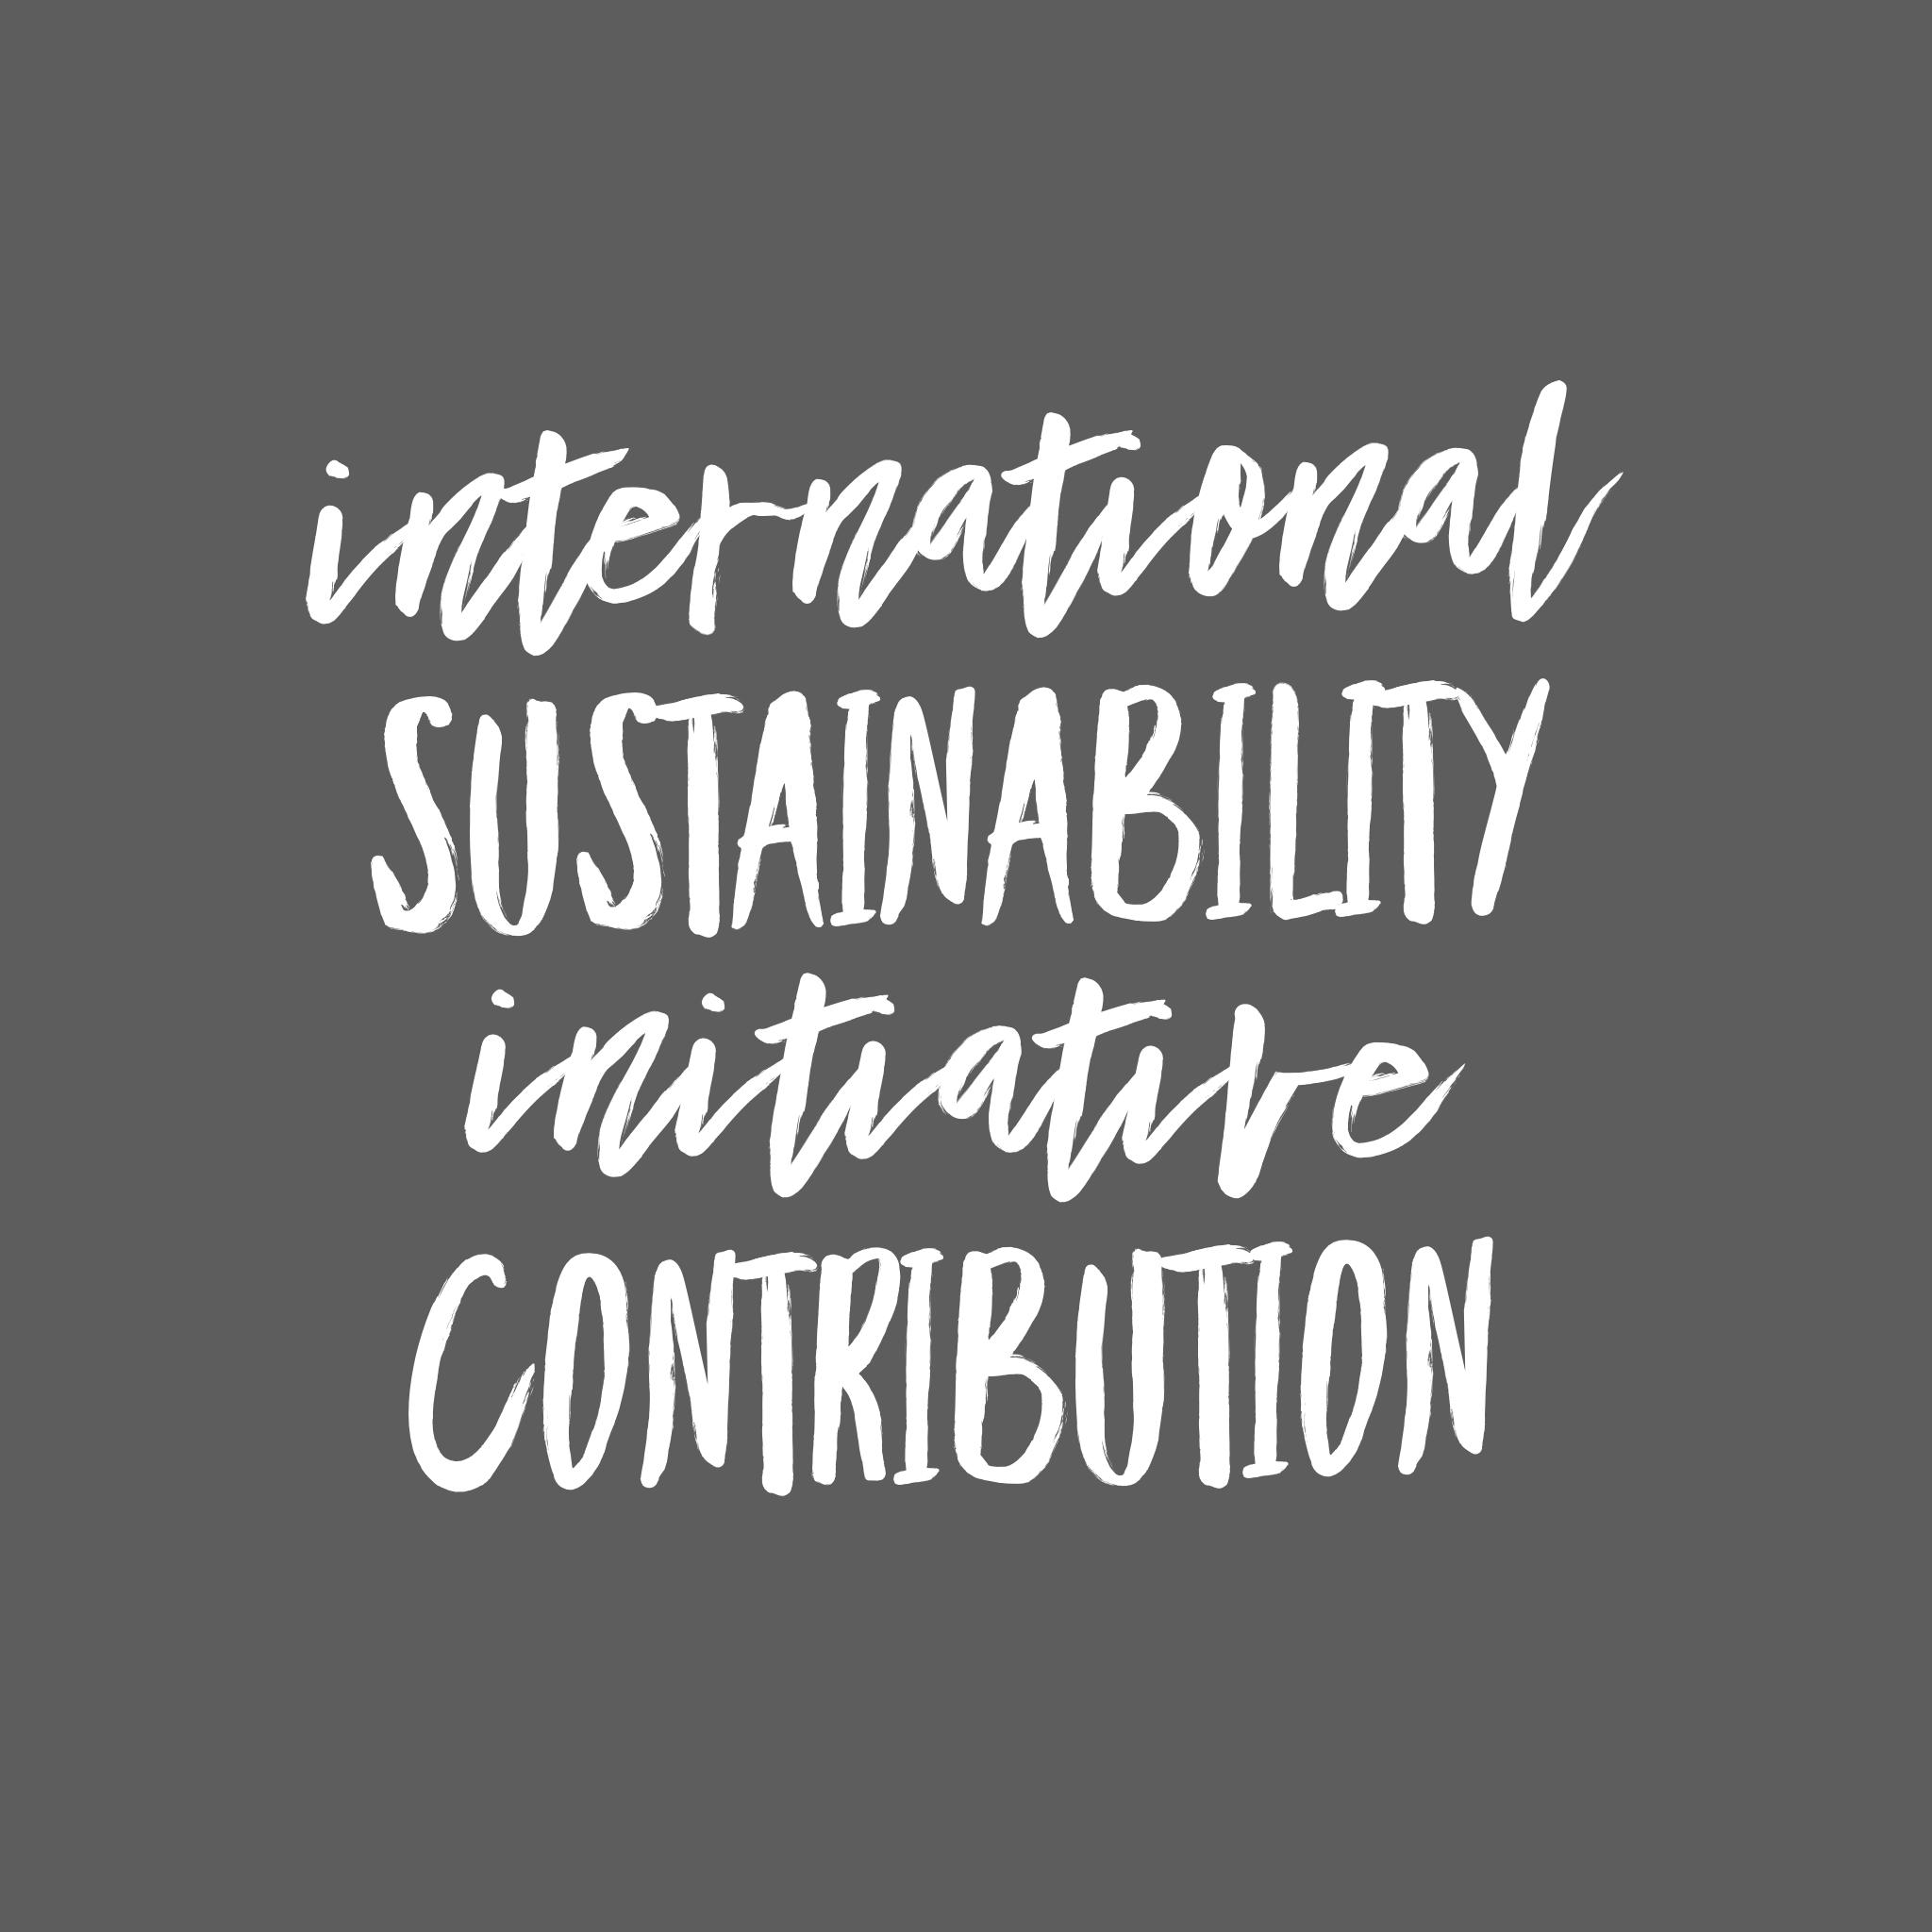 International Sustainability Initiative Contribution